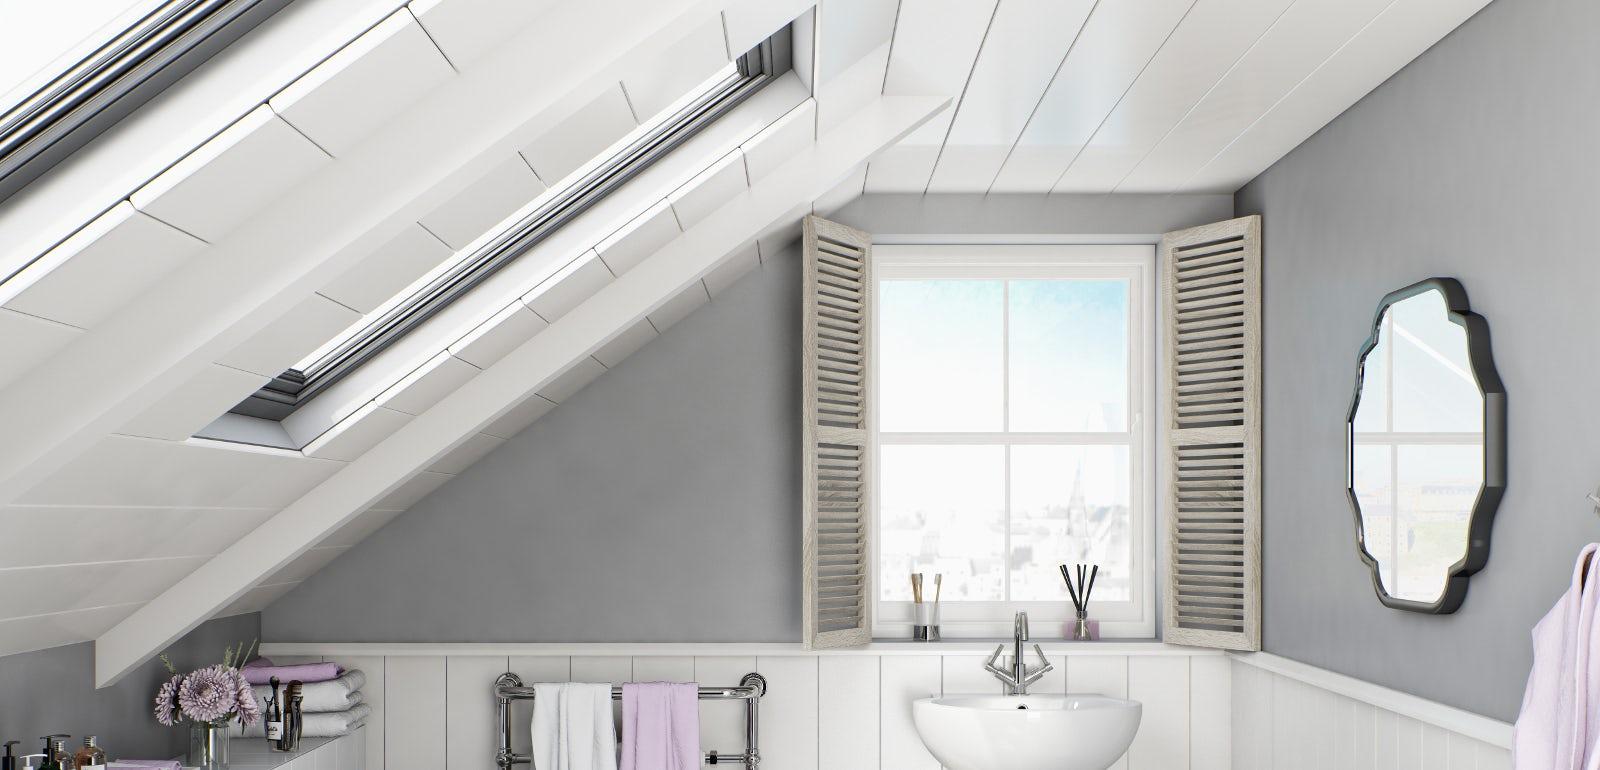 Planning a small bathroom